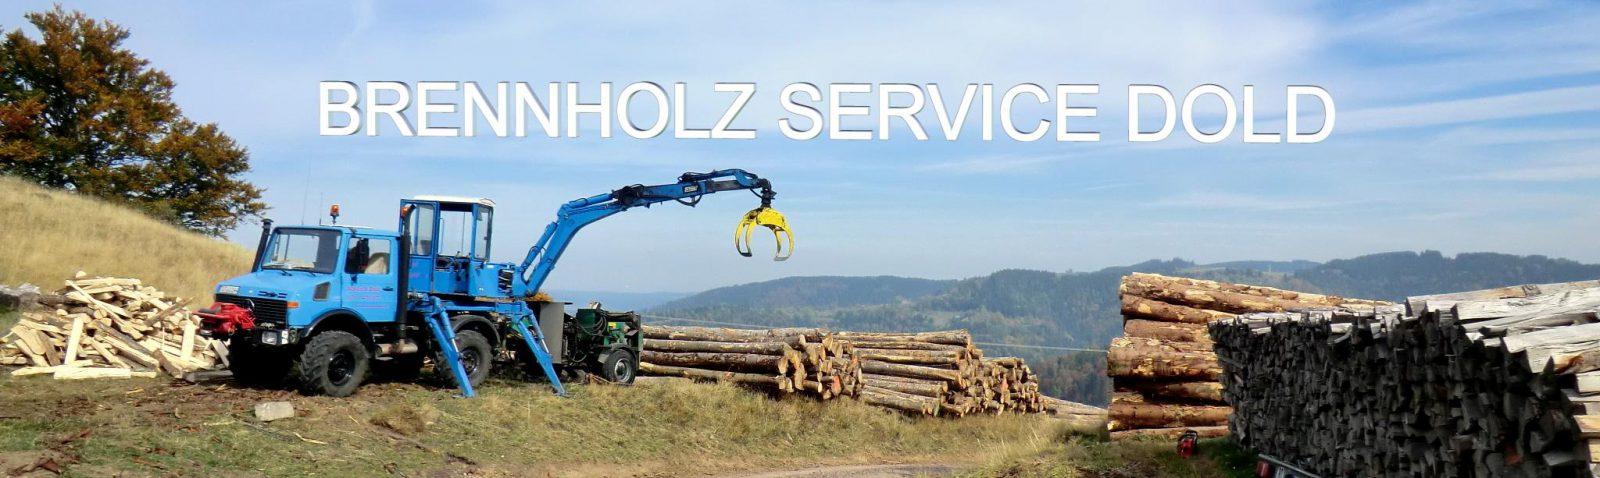 Brennholzservice Dold